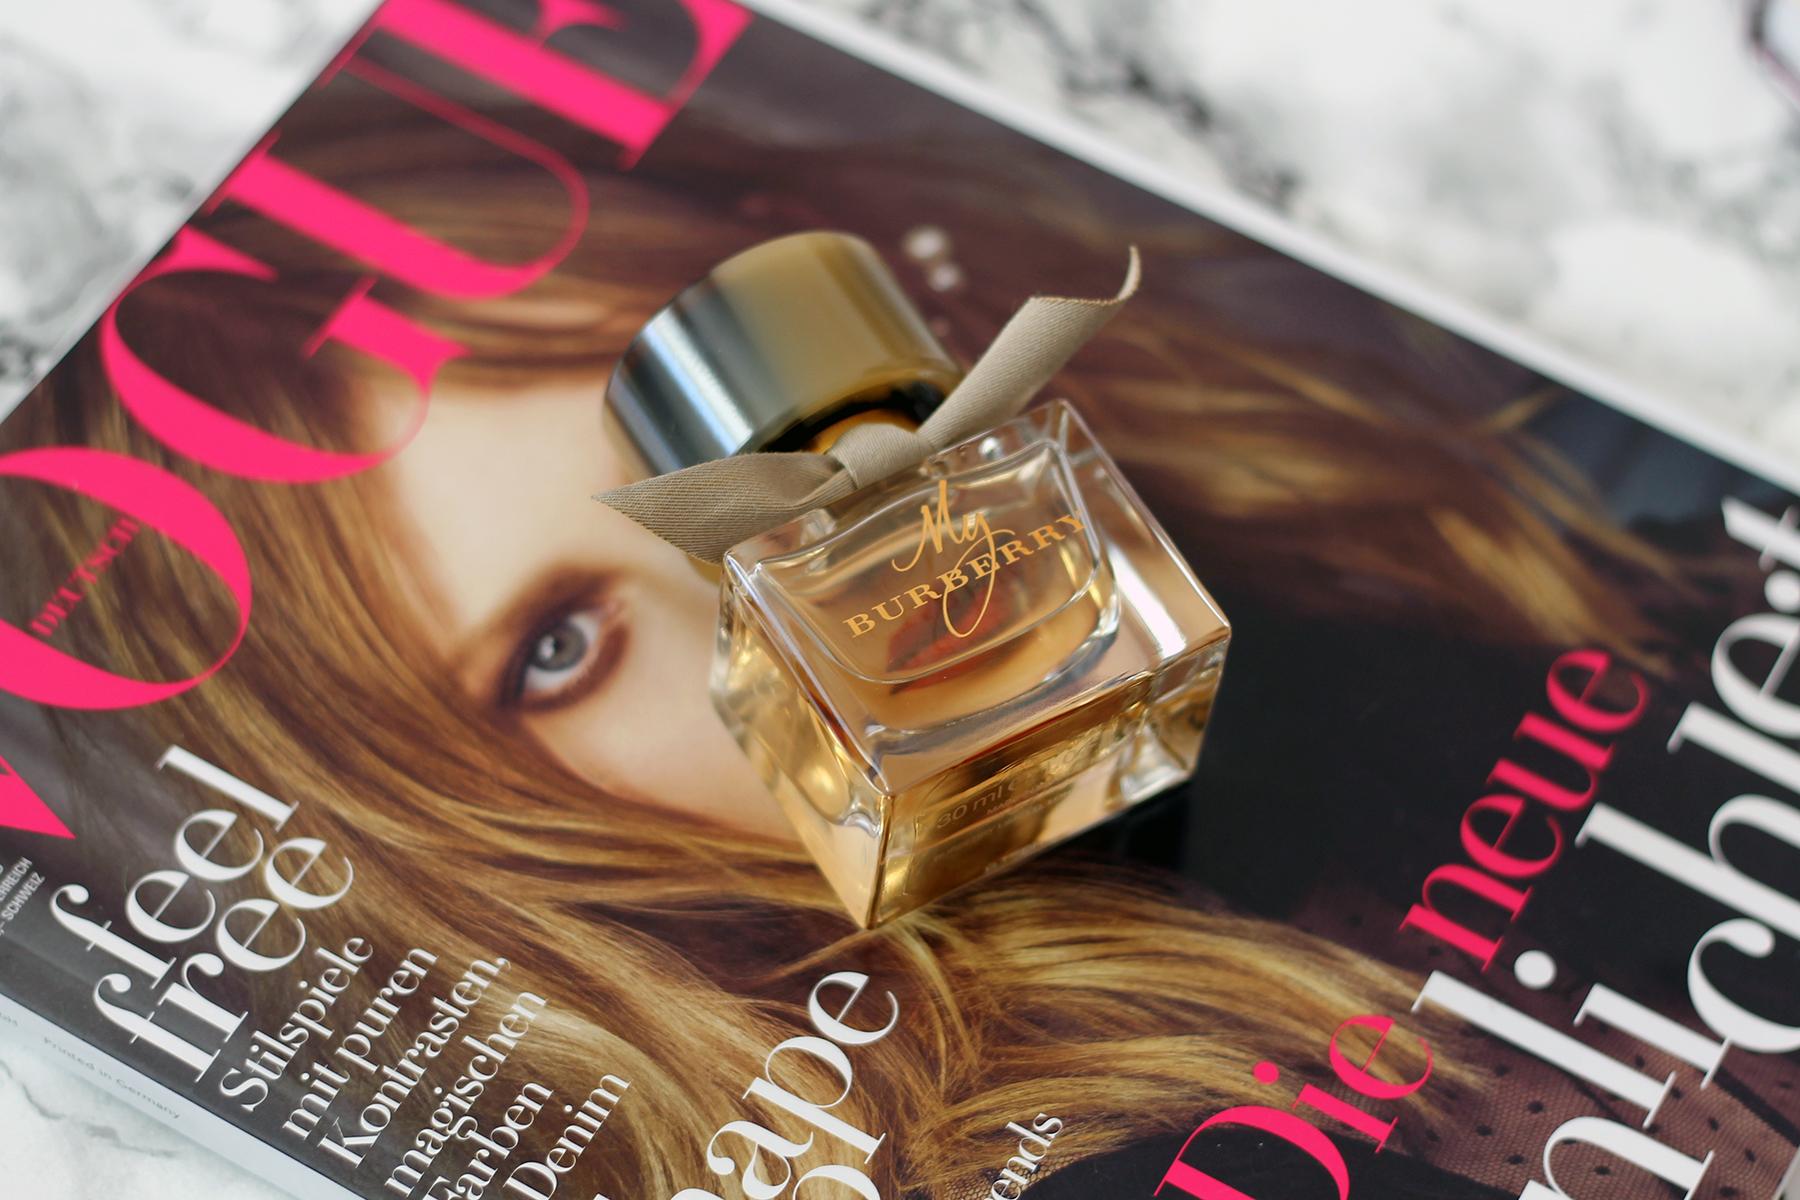 my-burberry-parfüm-duft-haul-beautyblog-fashionblog-modeblog-deutschland